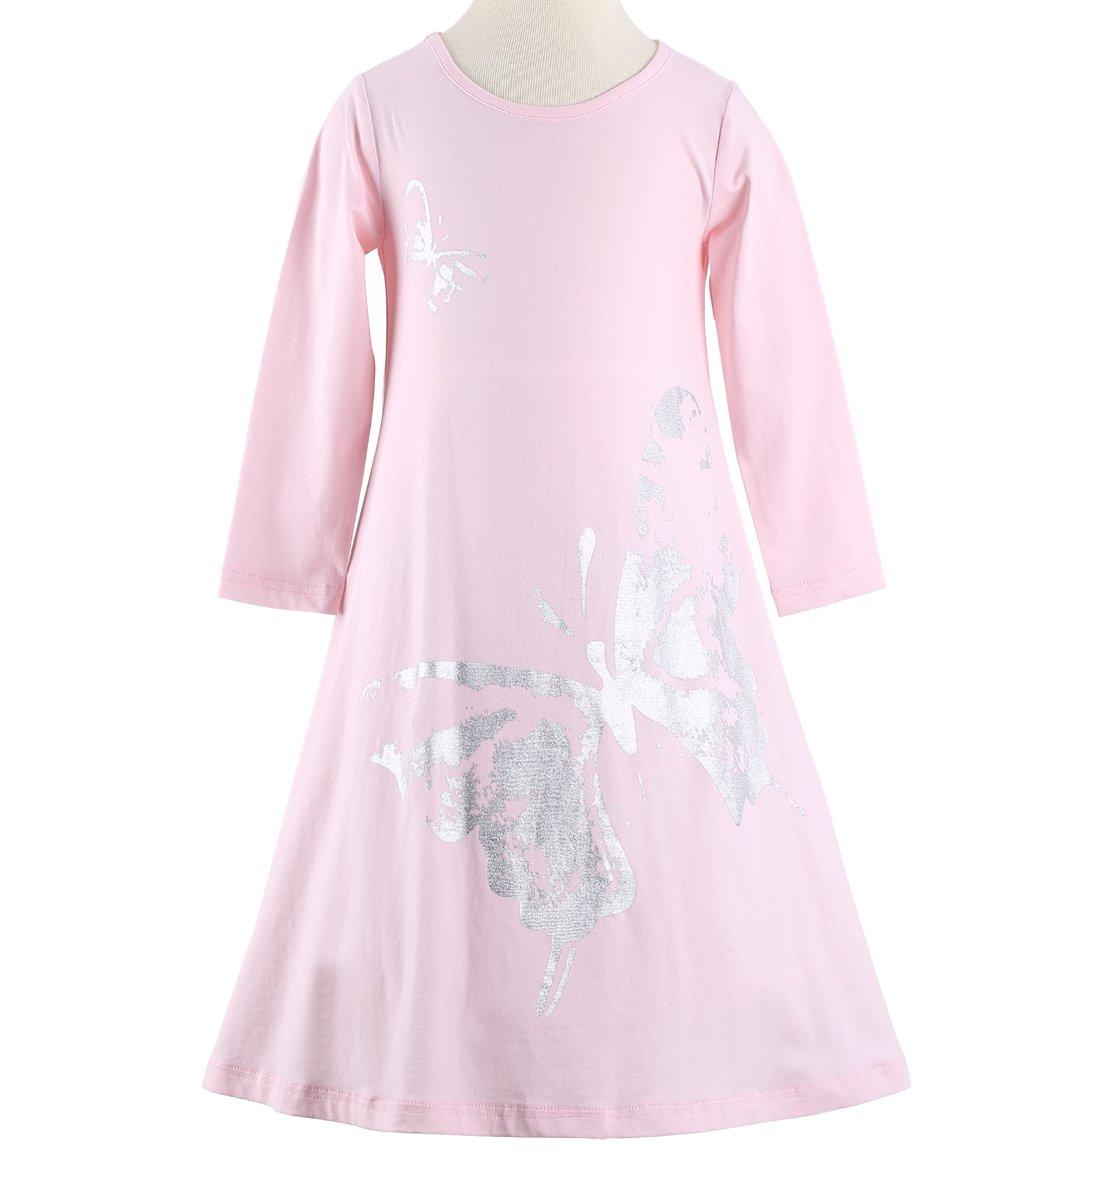 Happy B00PFYQ6X6 Rose Niñas Butterfly Butterfly Print vestido Happy ...